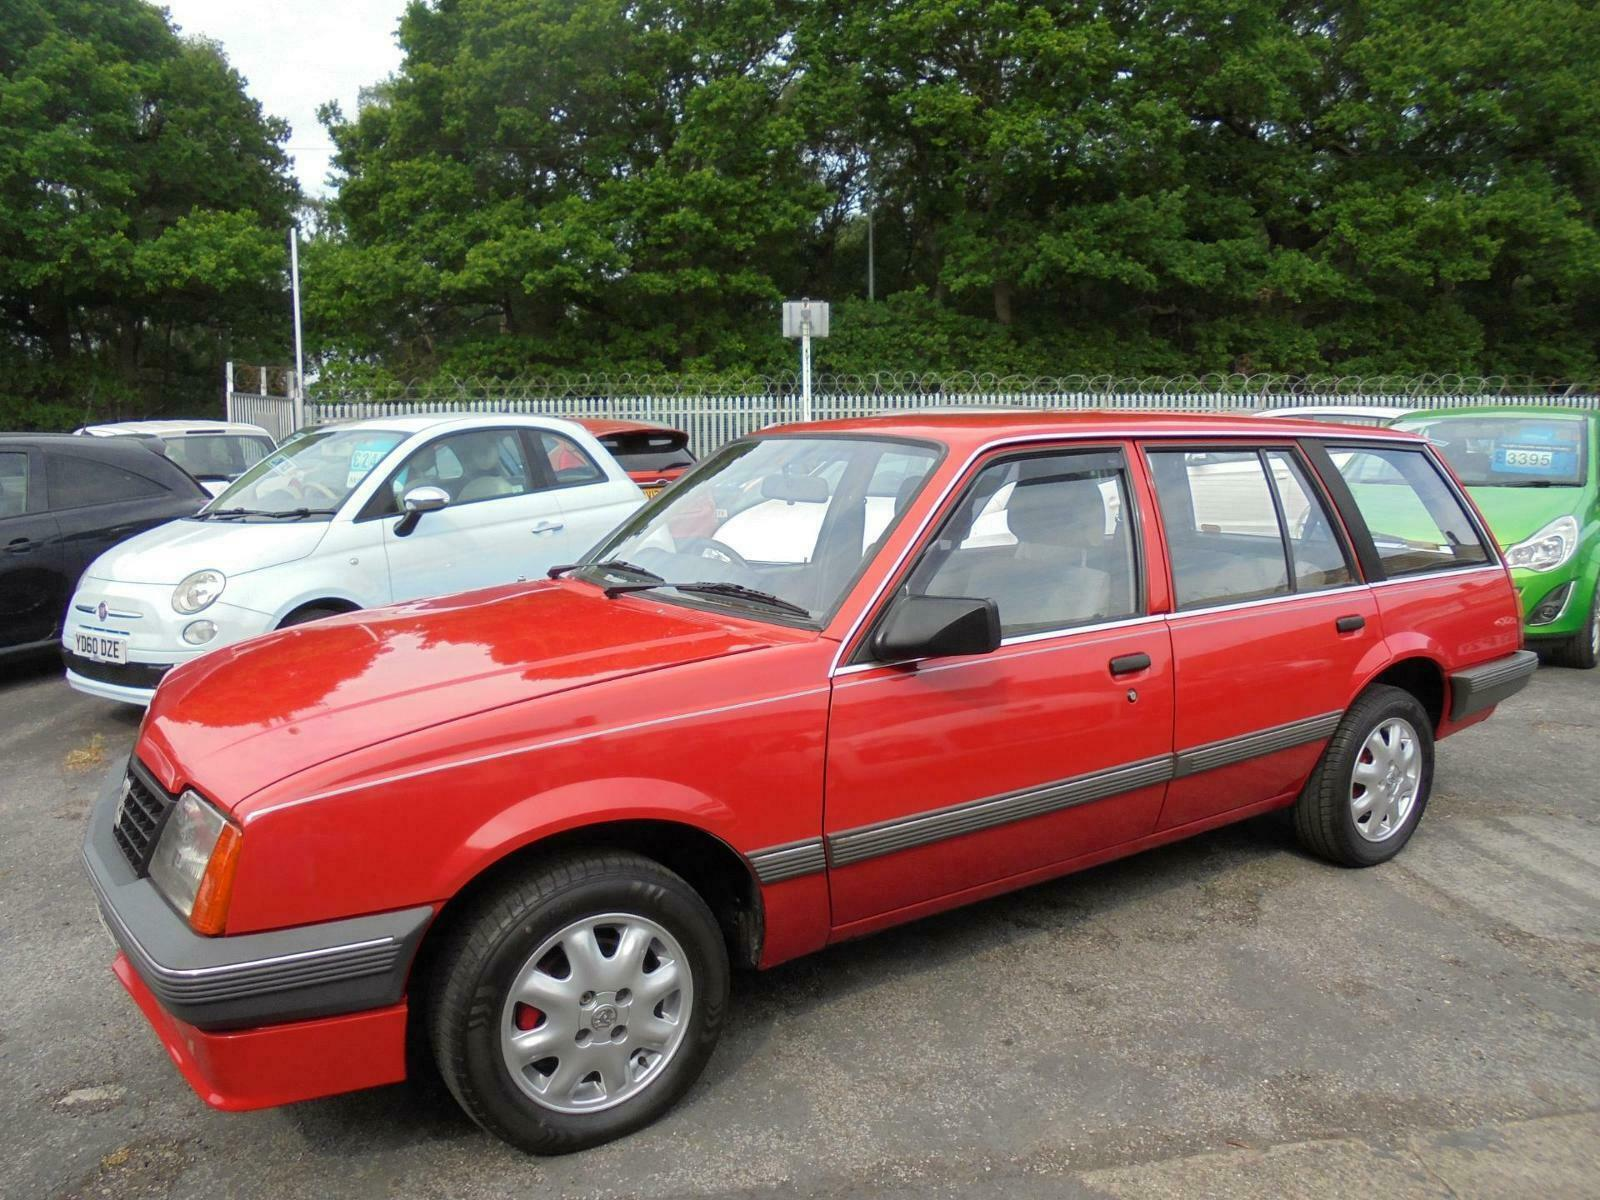 Unexceptional Classifieds: Vauxhall Cavalier Estate